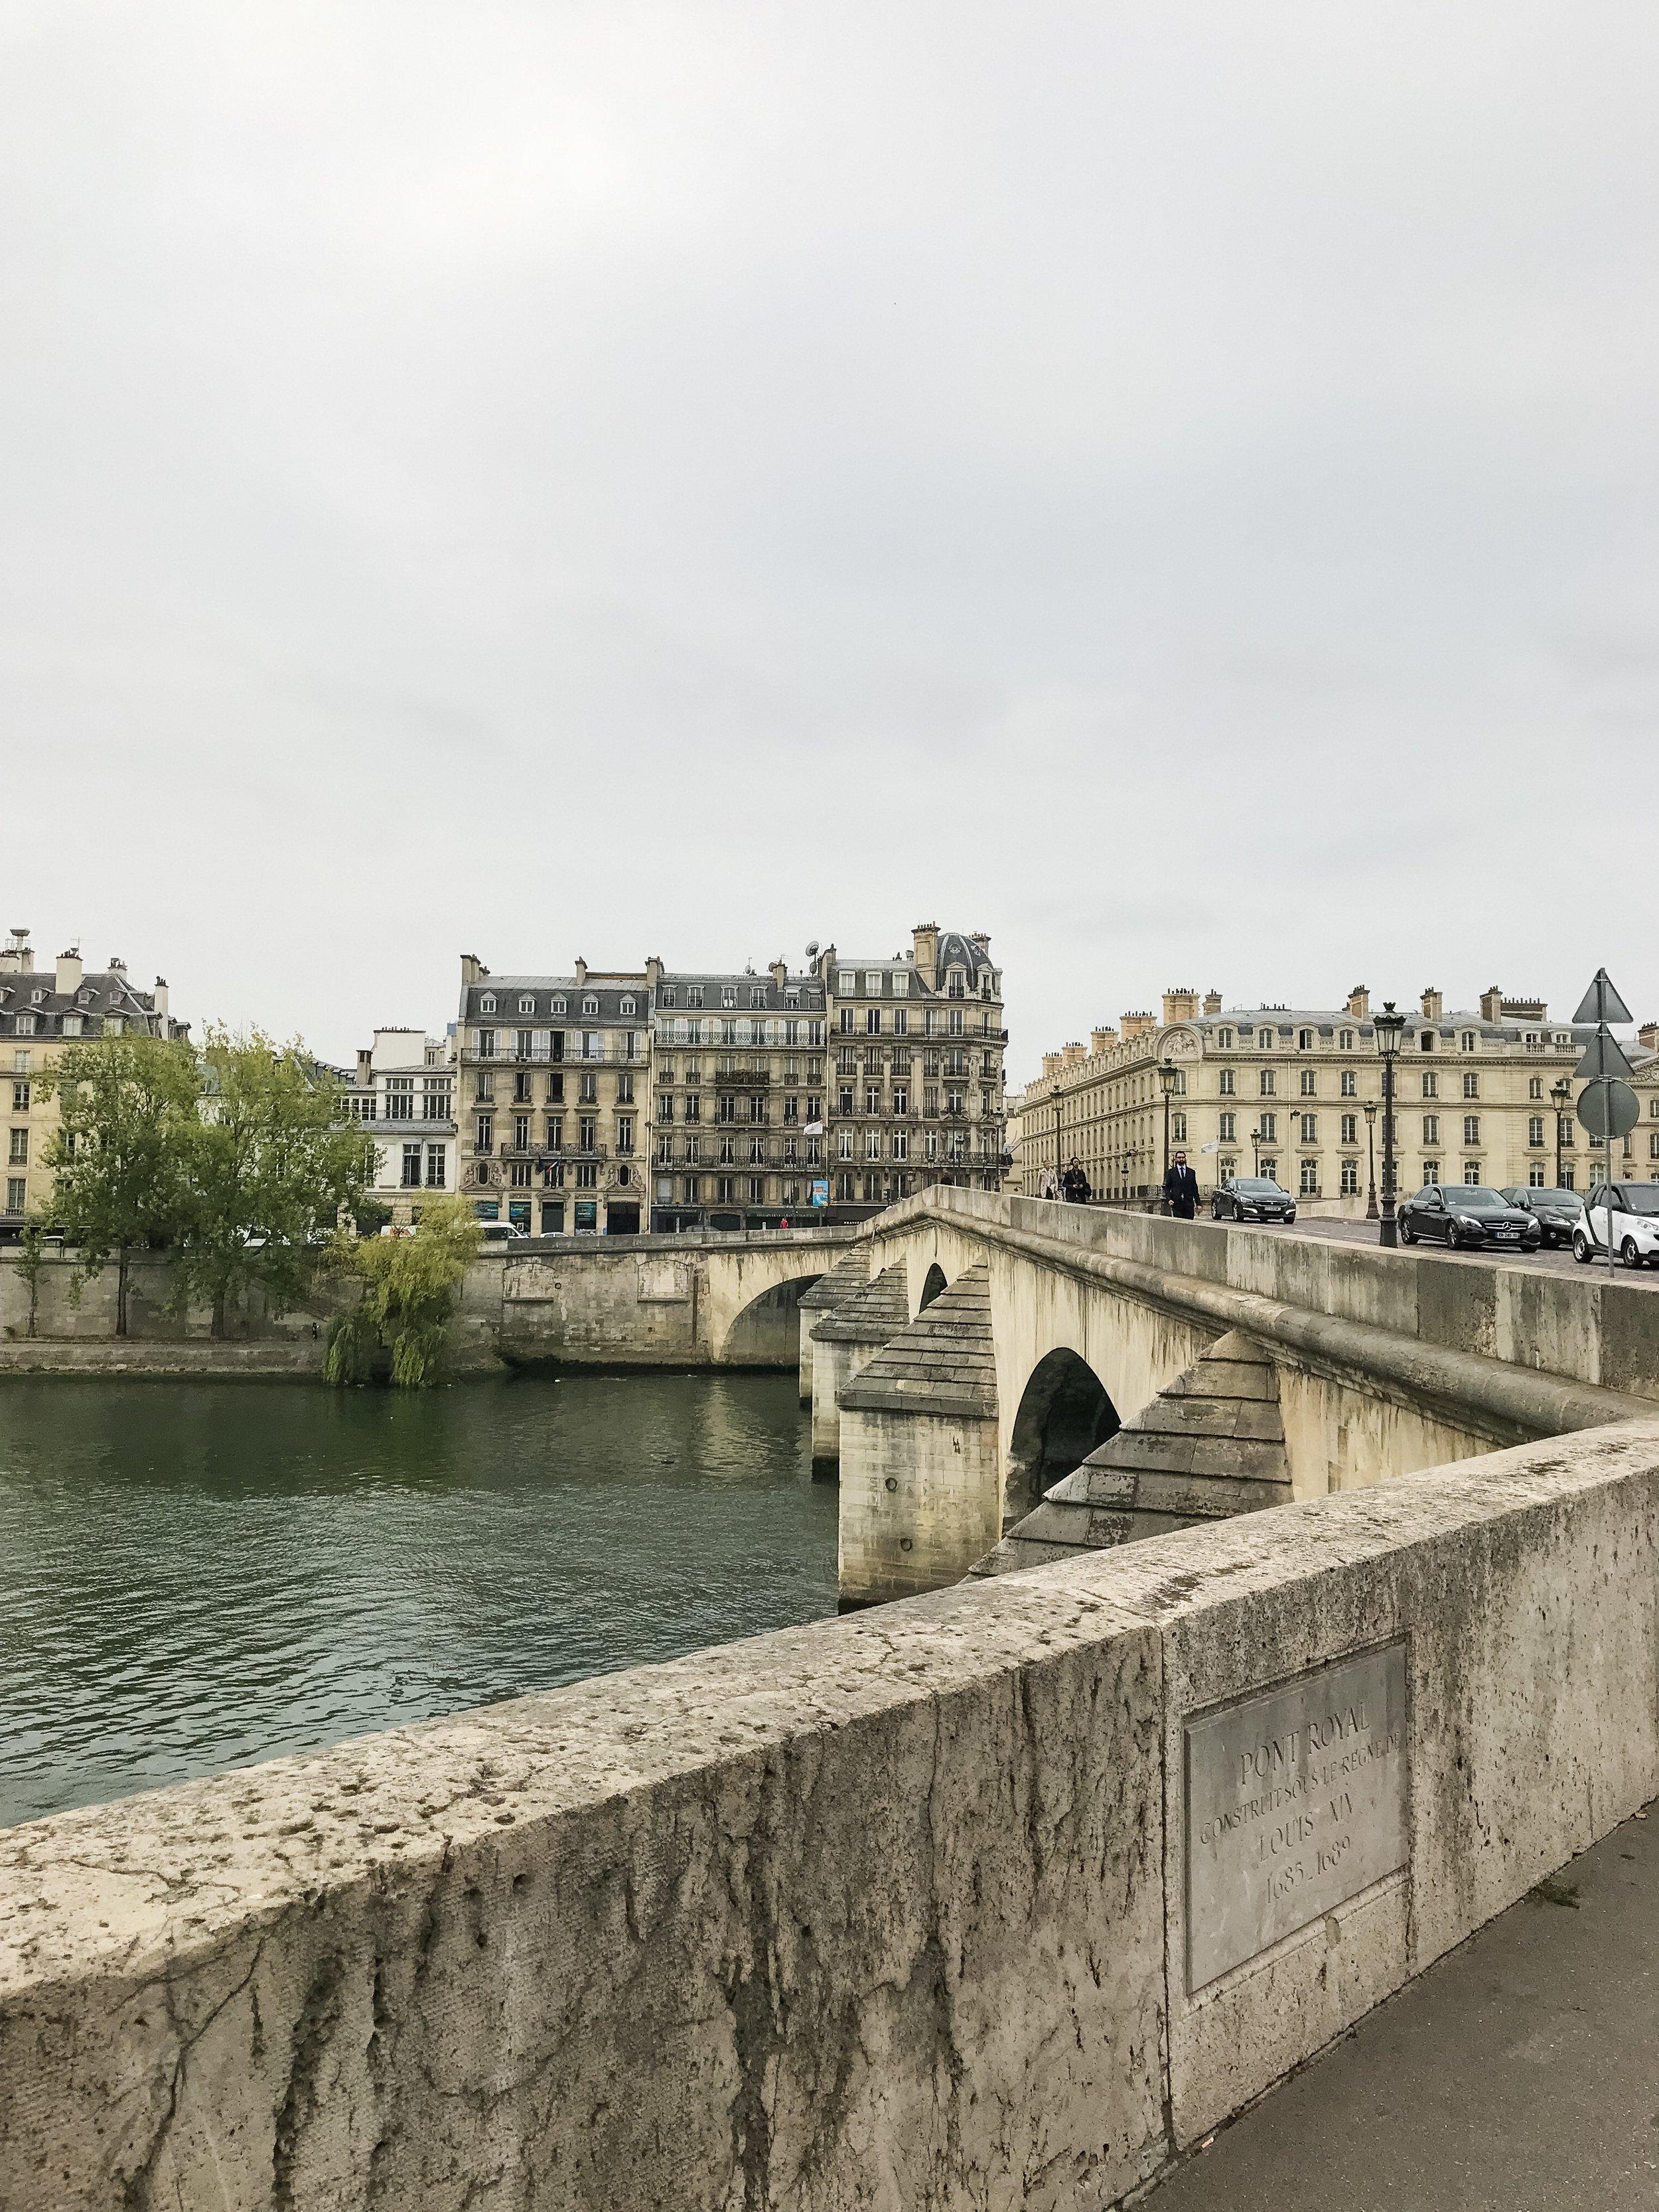 Crossing the Pont Royal bridge